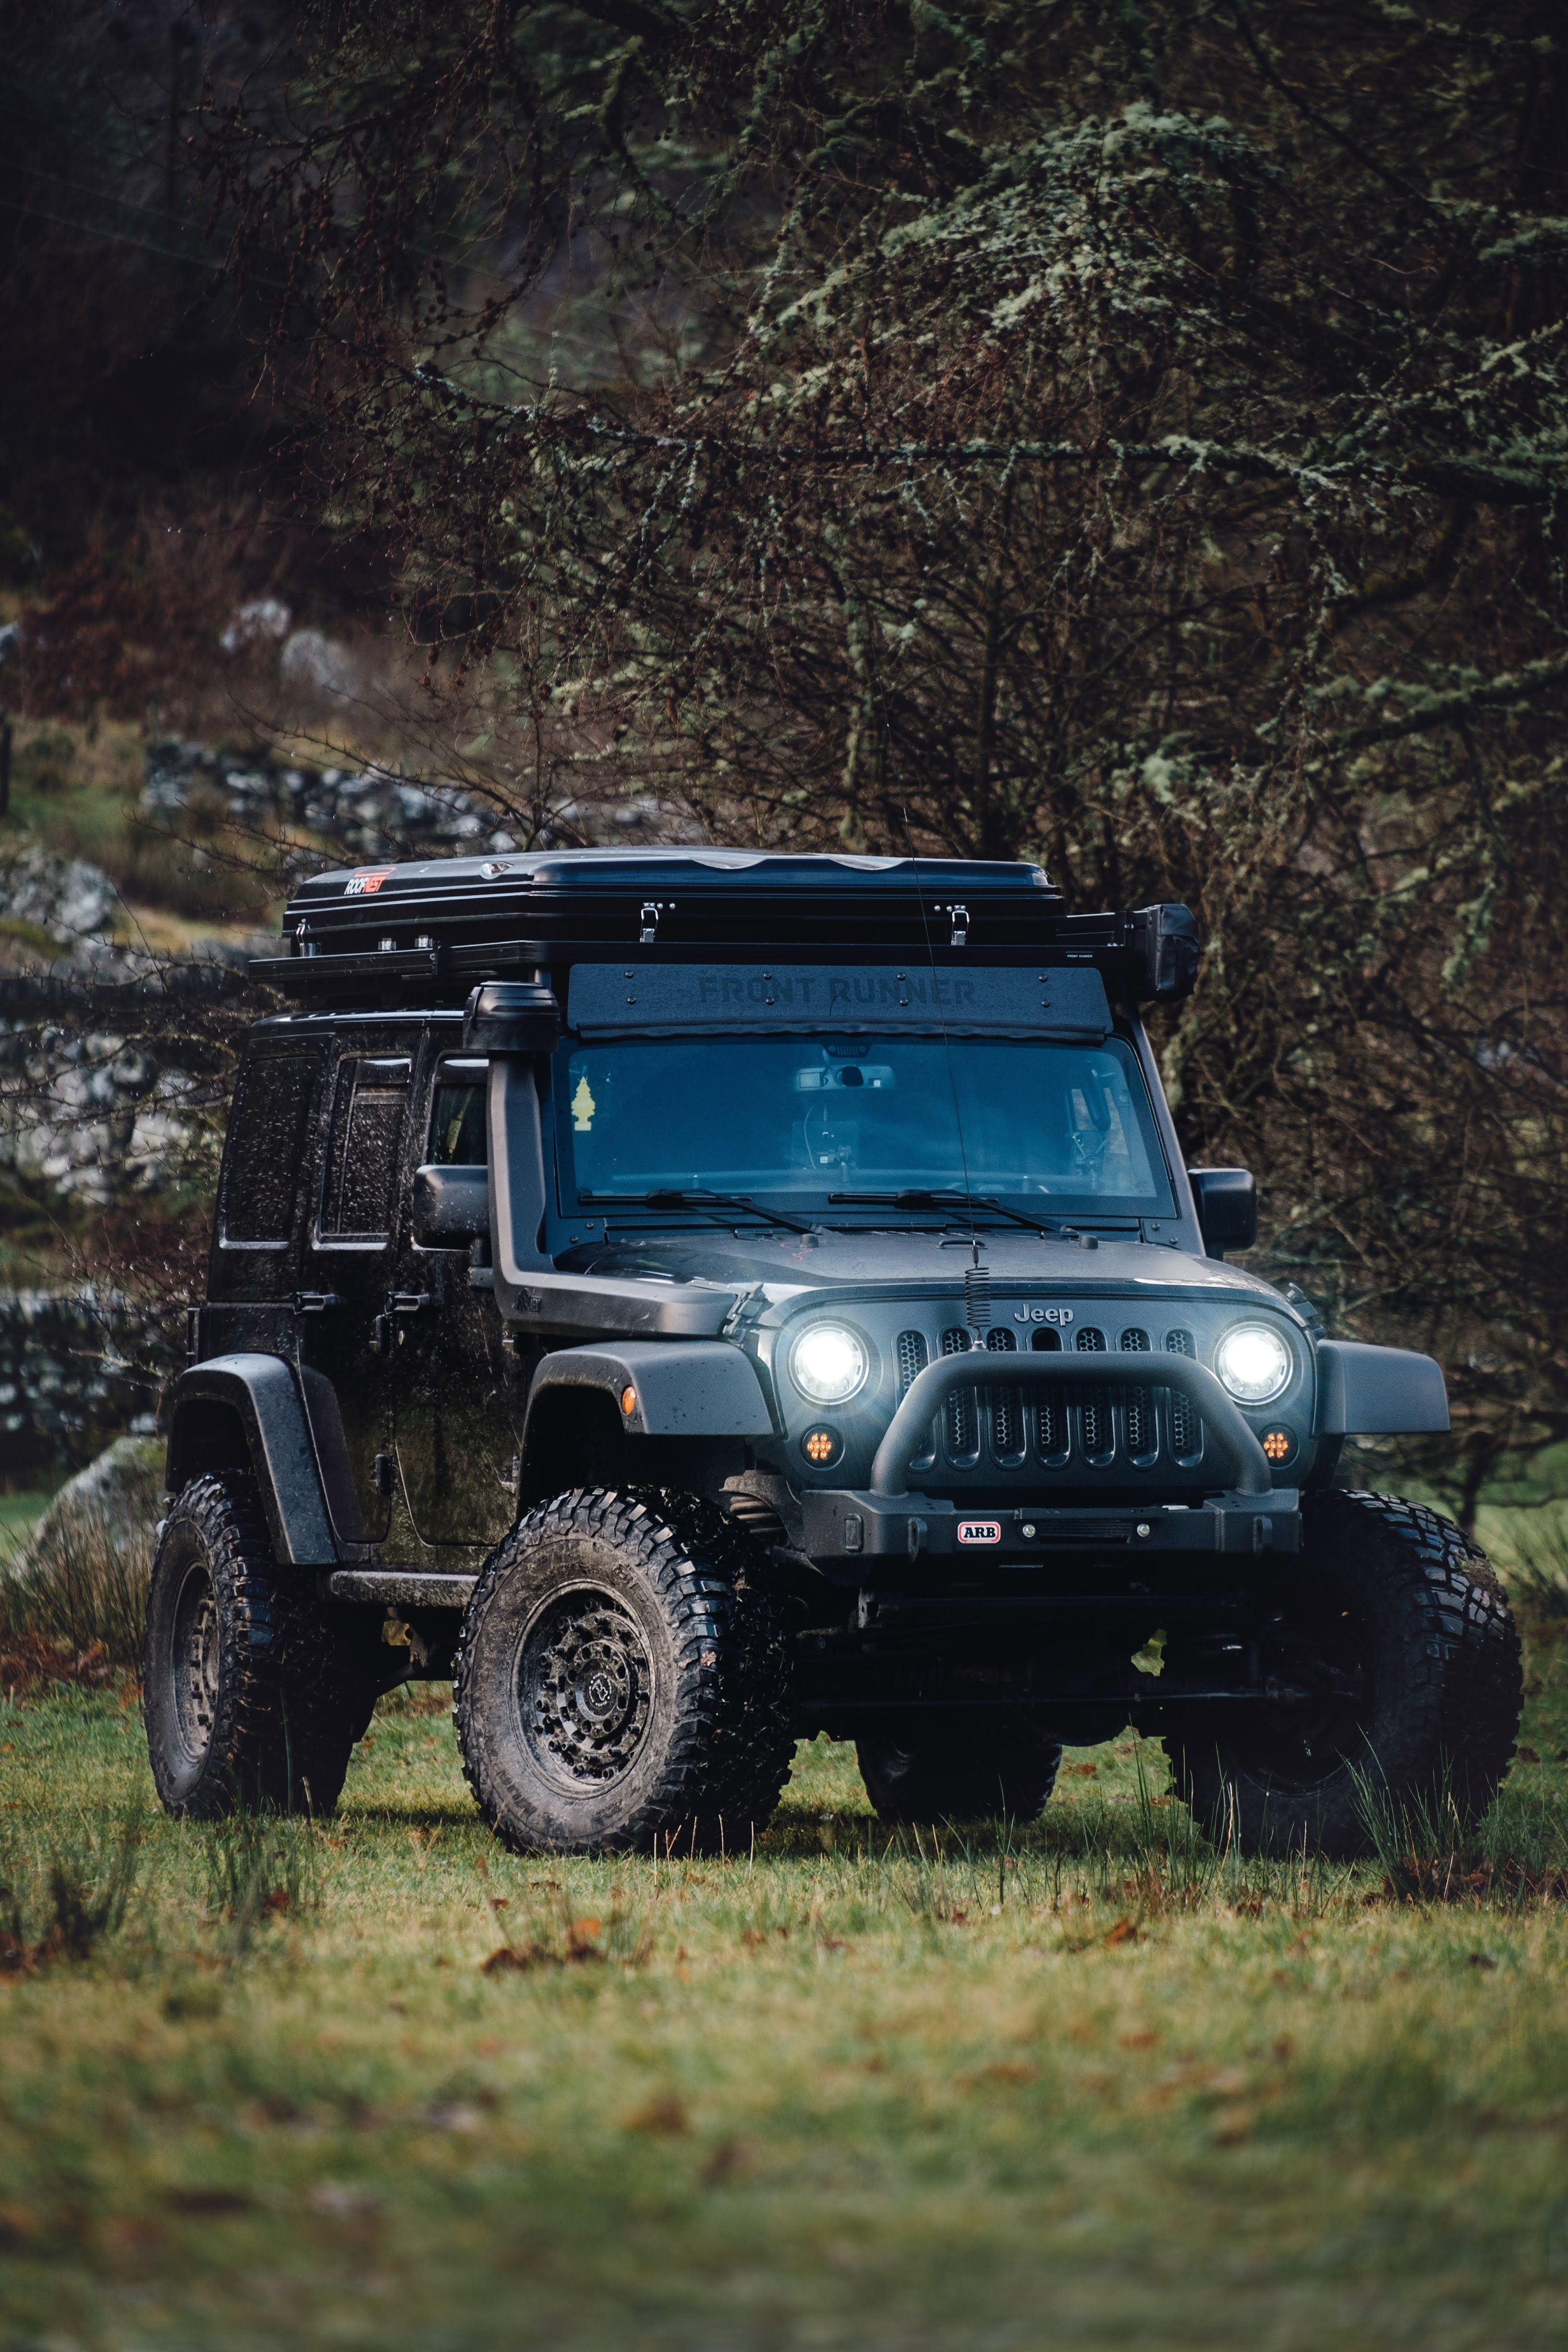 Black Jeep Wrangler Suv Photo Free Transportation Image On Unsplash